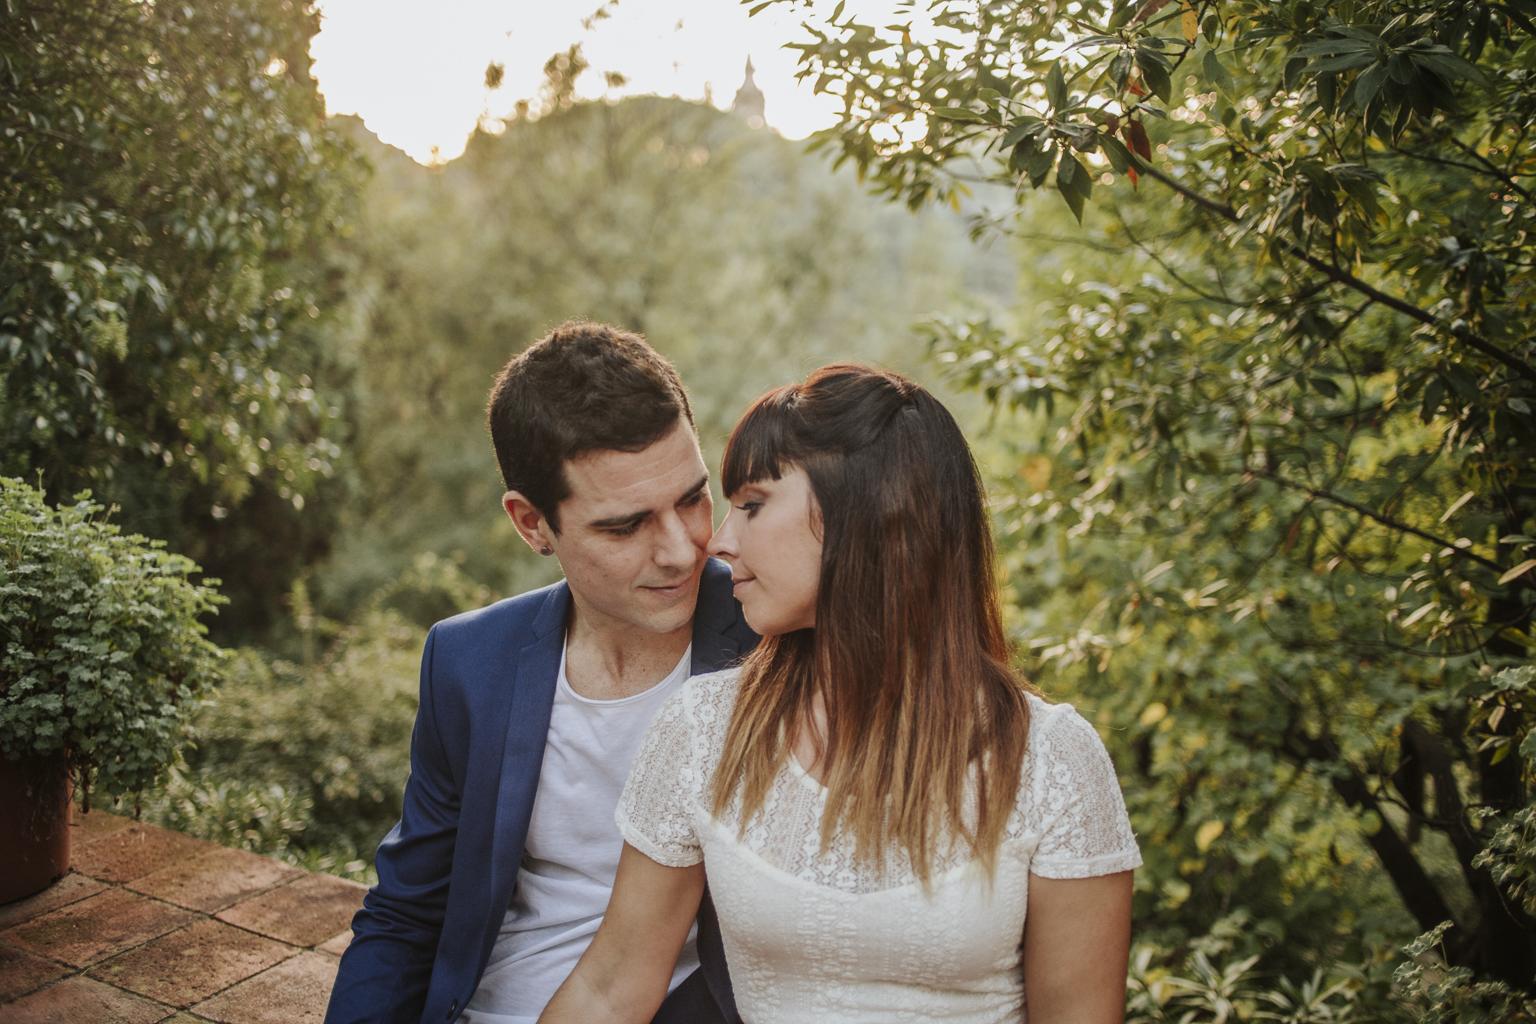 fotógrafo boda barcelona :: Barcelona Wedding photographer :: Montjuic :: Novia de color :: Fotógrafo boda Sant Cugat :: fotógrafo de boda natural